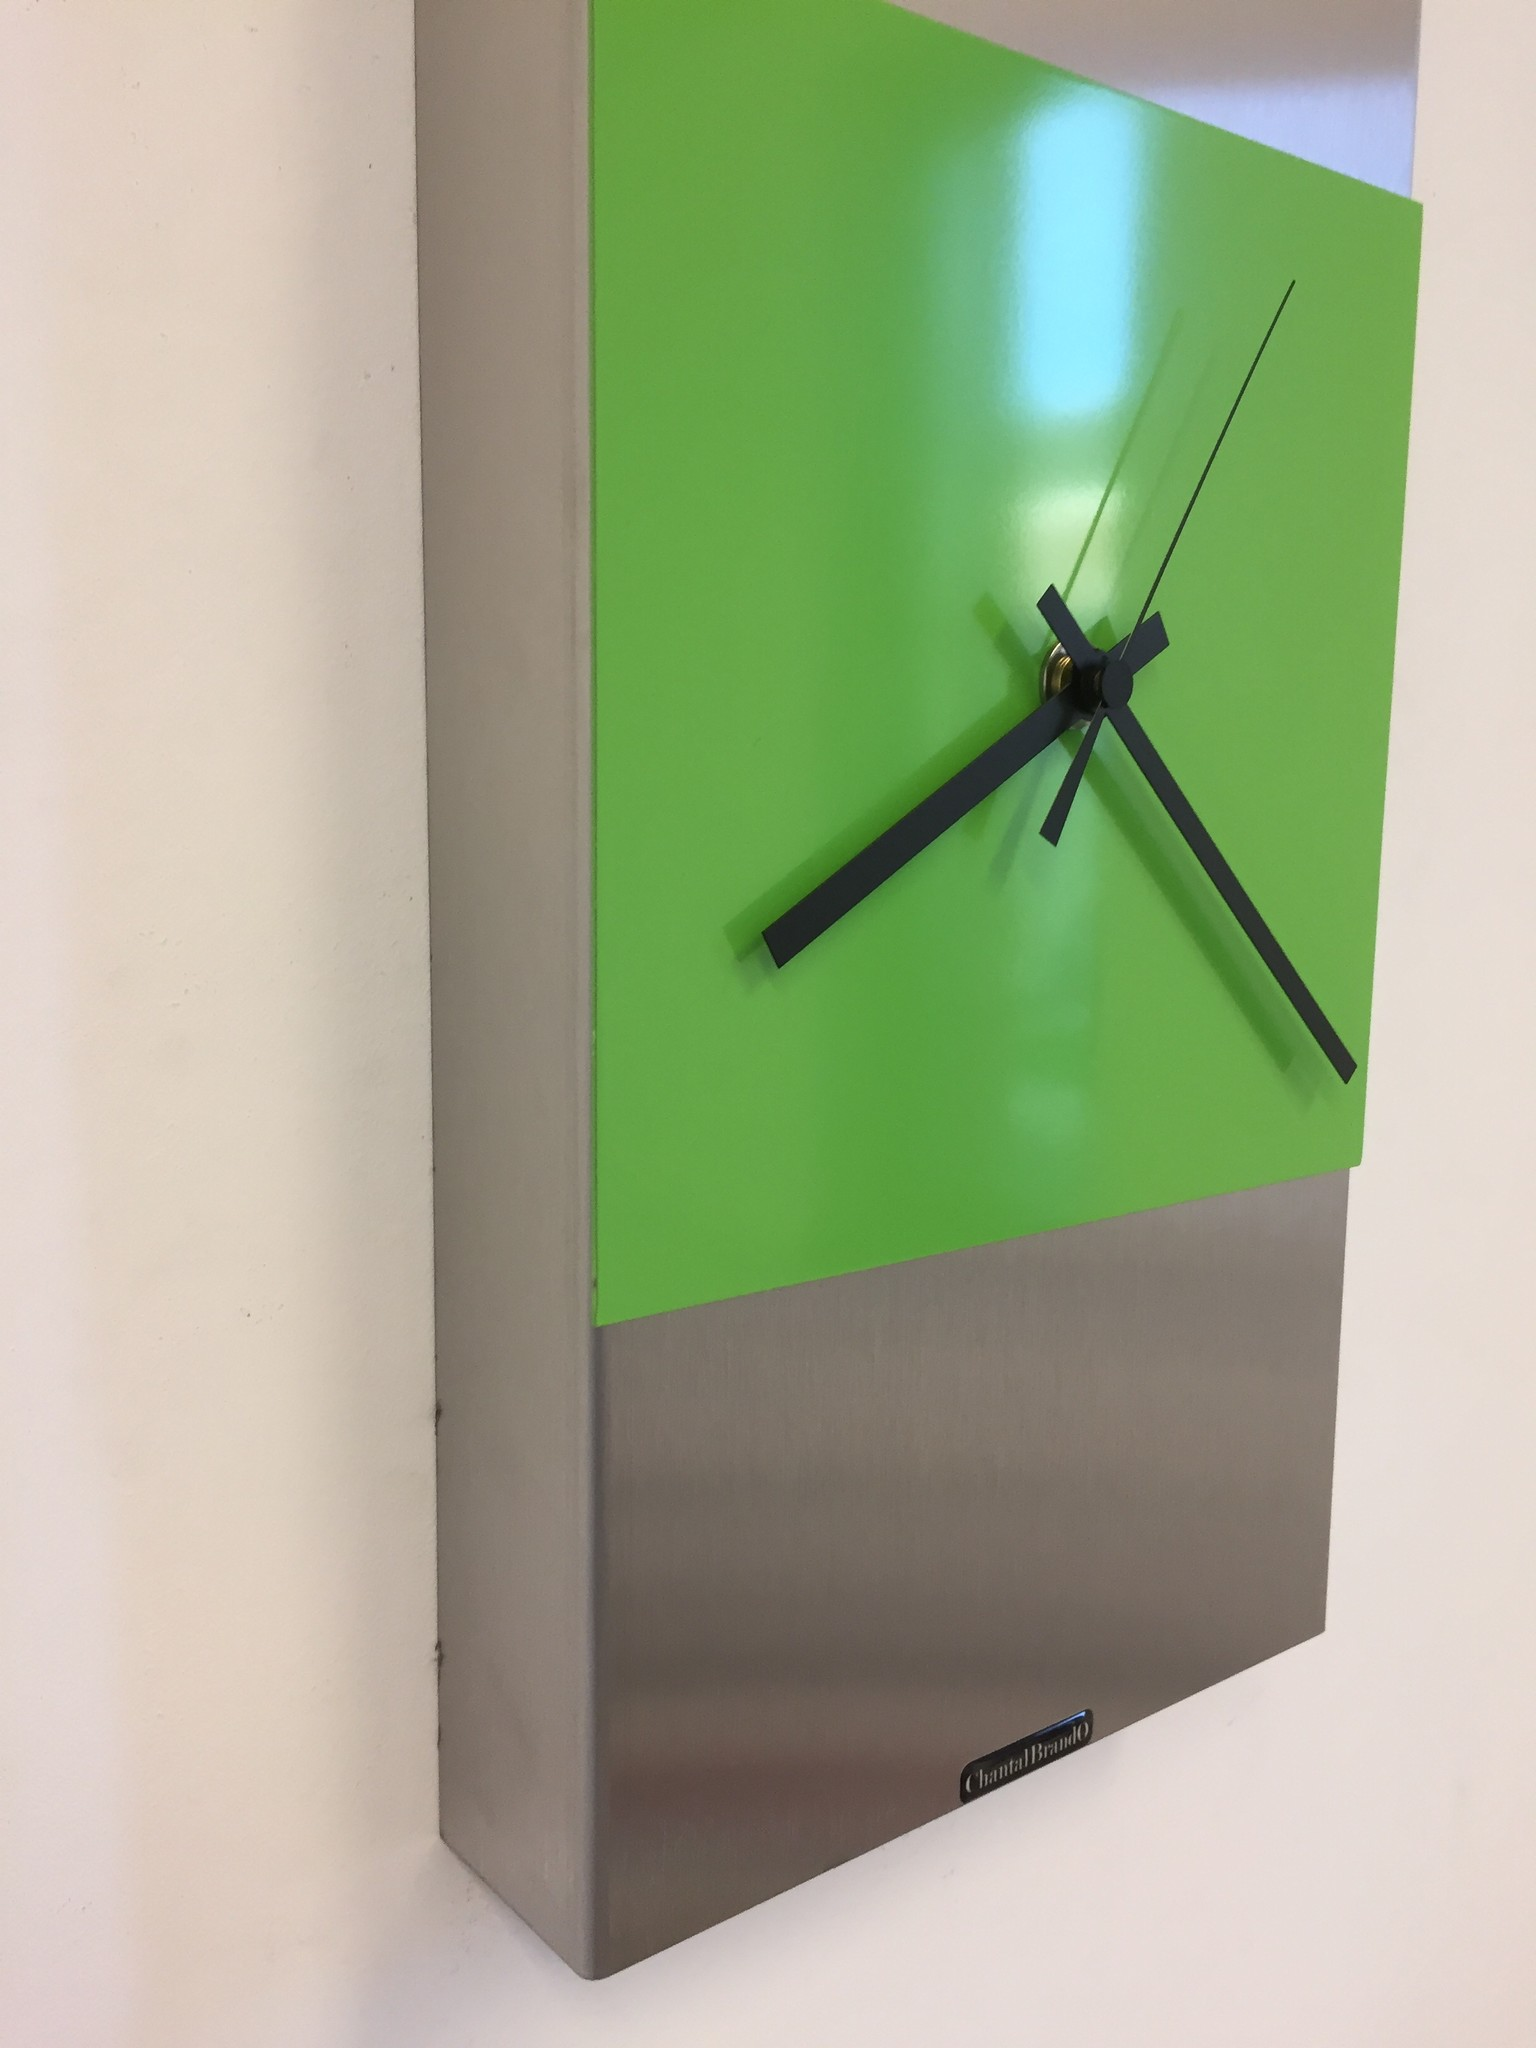 ChantalBrandO Wandklok ExtraVaganzA Green